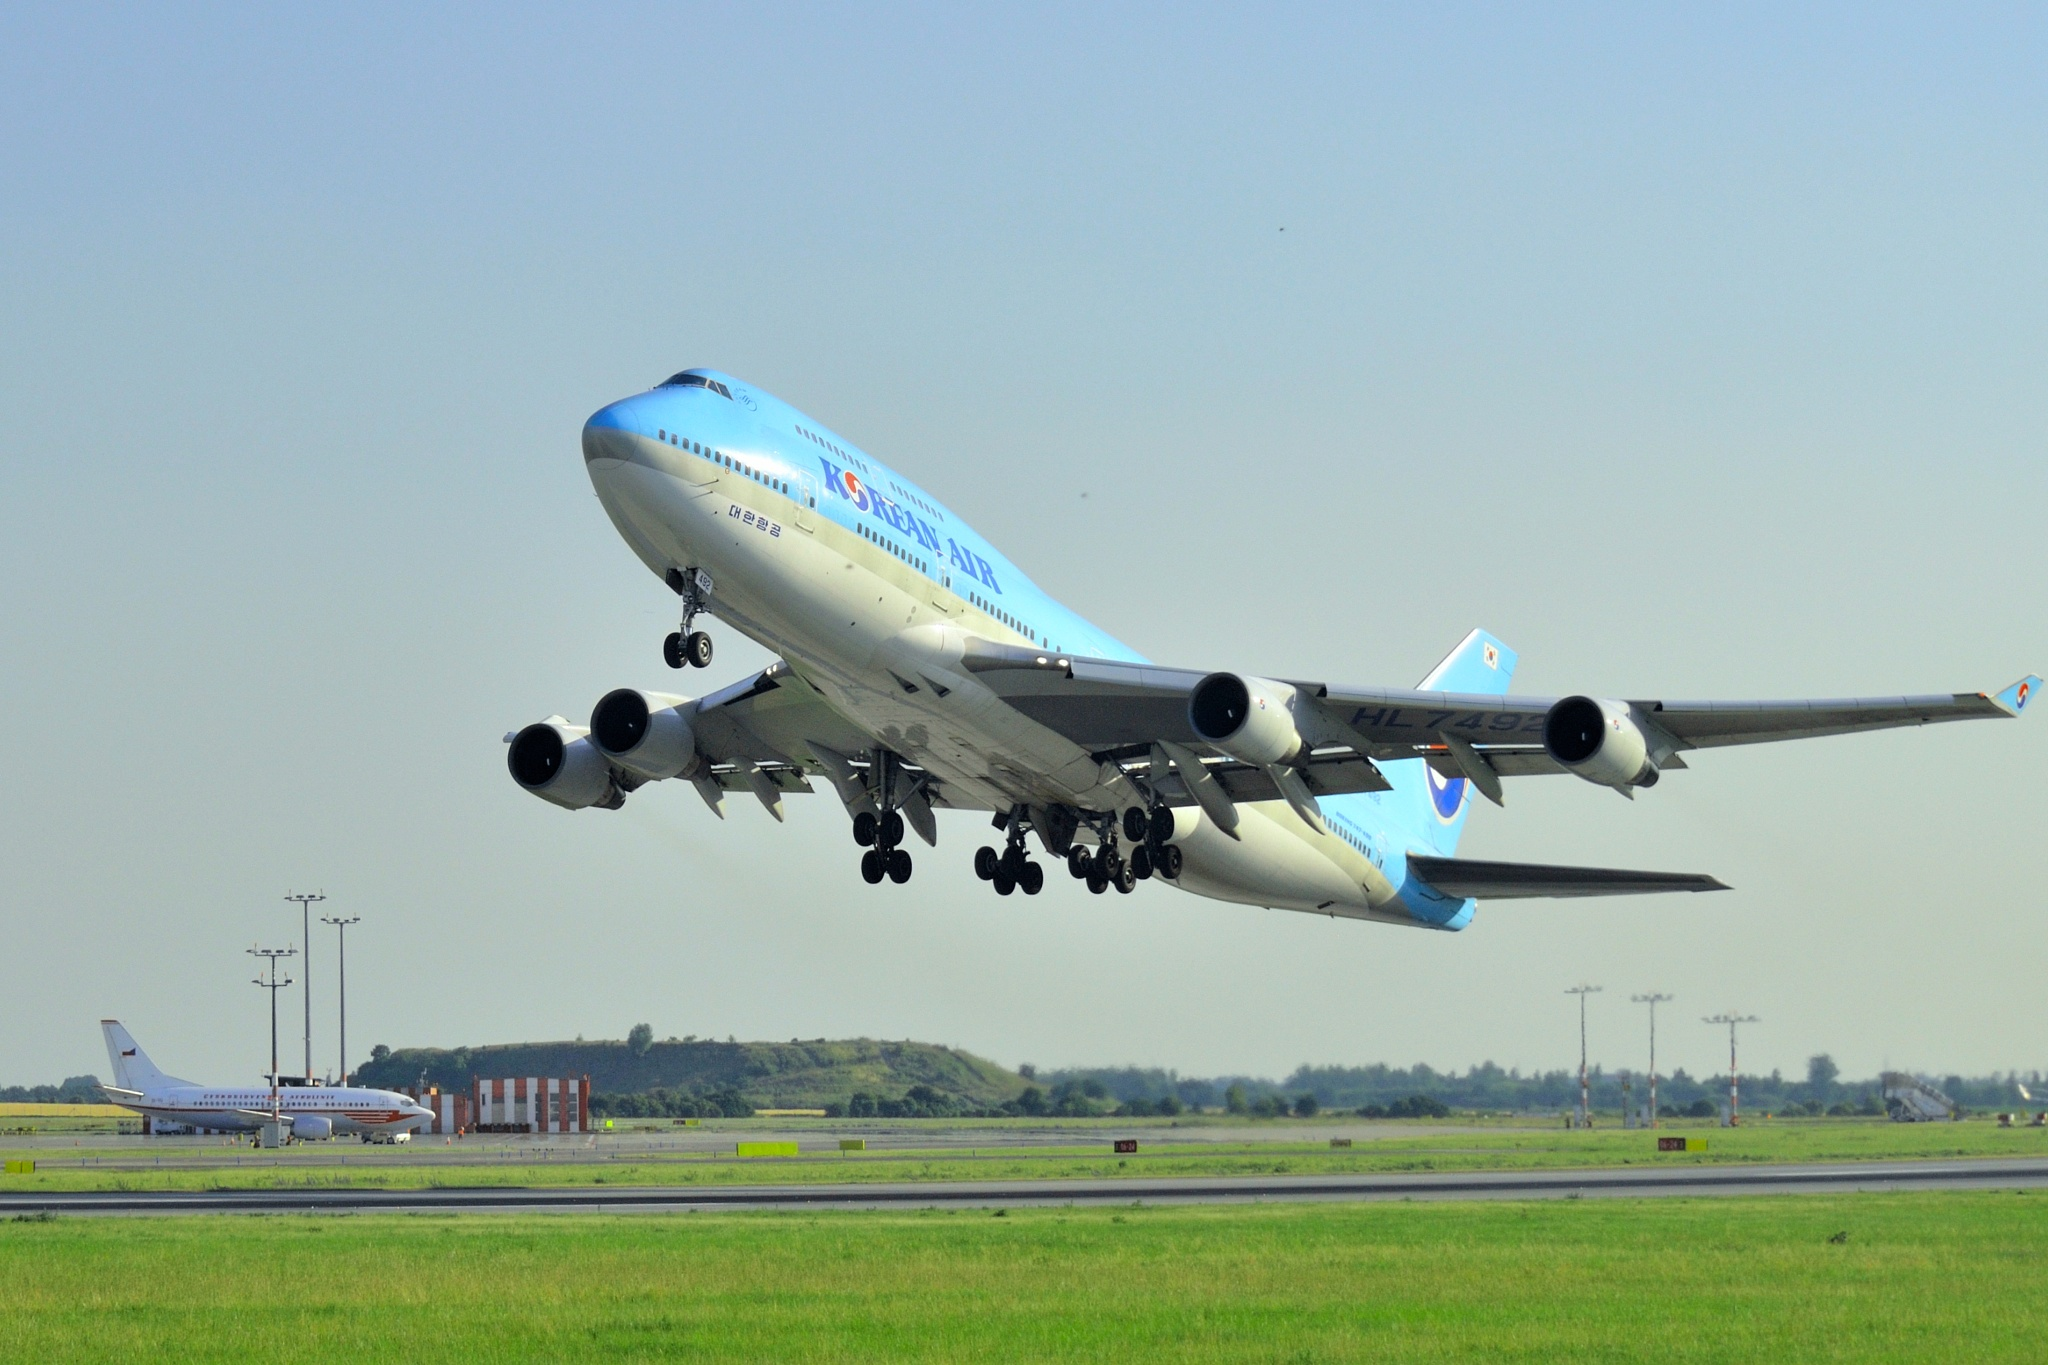 take-off by Edwards